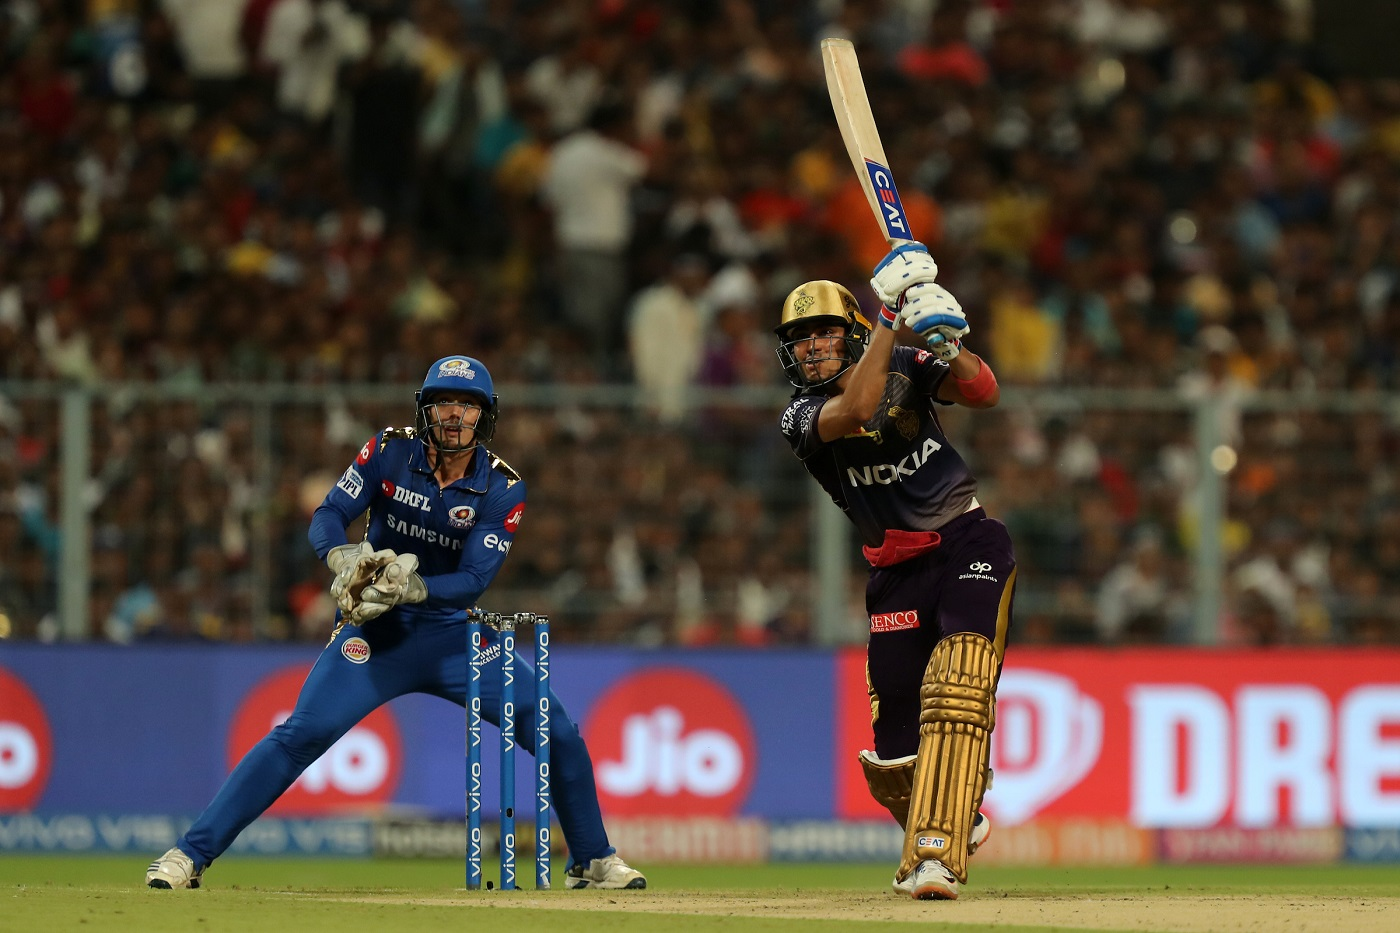 IPL 2019: Match 47, KKR vs MI - Twitter Erupts as Andre Russell's Late Strikes Help Kolkata Knight Riders Post 200+ Target 1